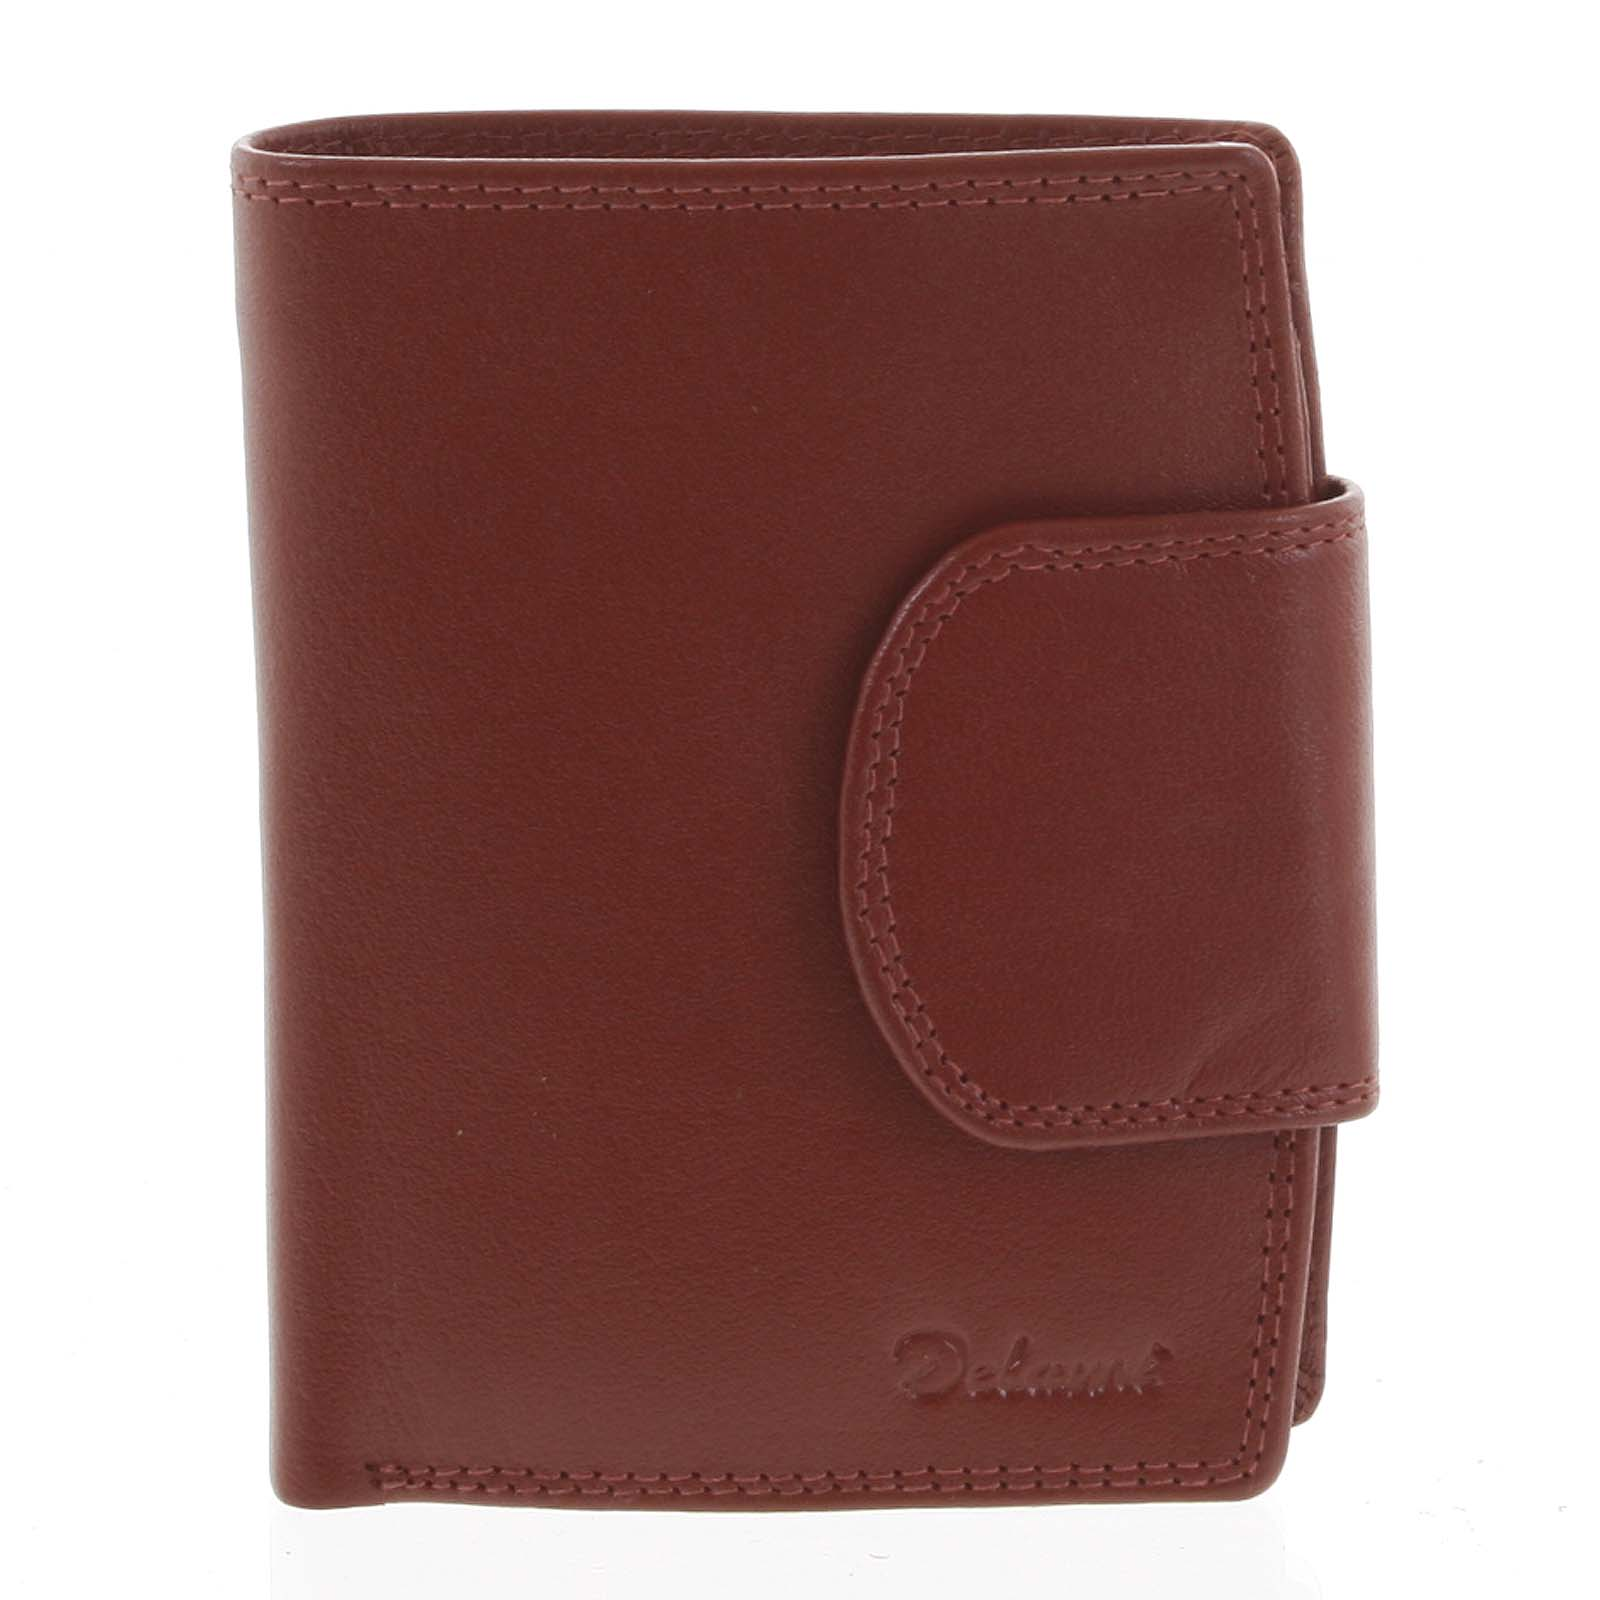 Kožená peňaženka červená - Delami Chase červená